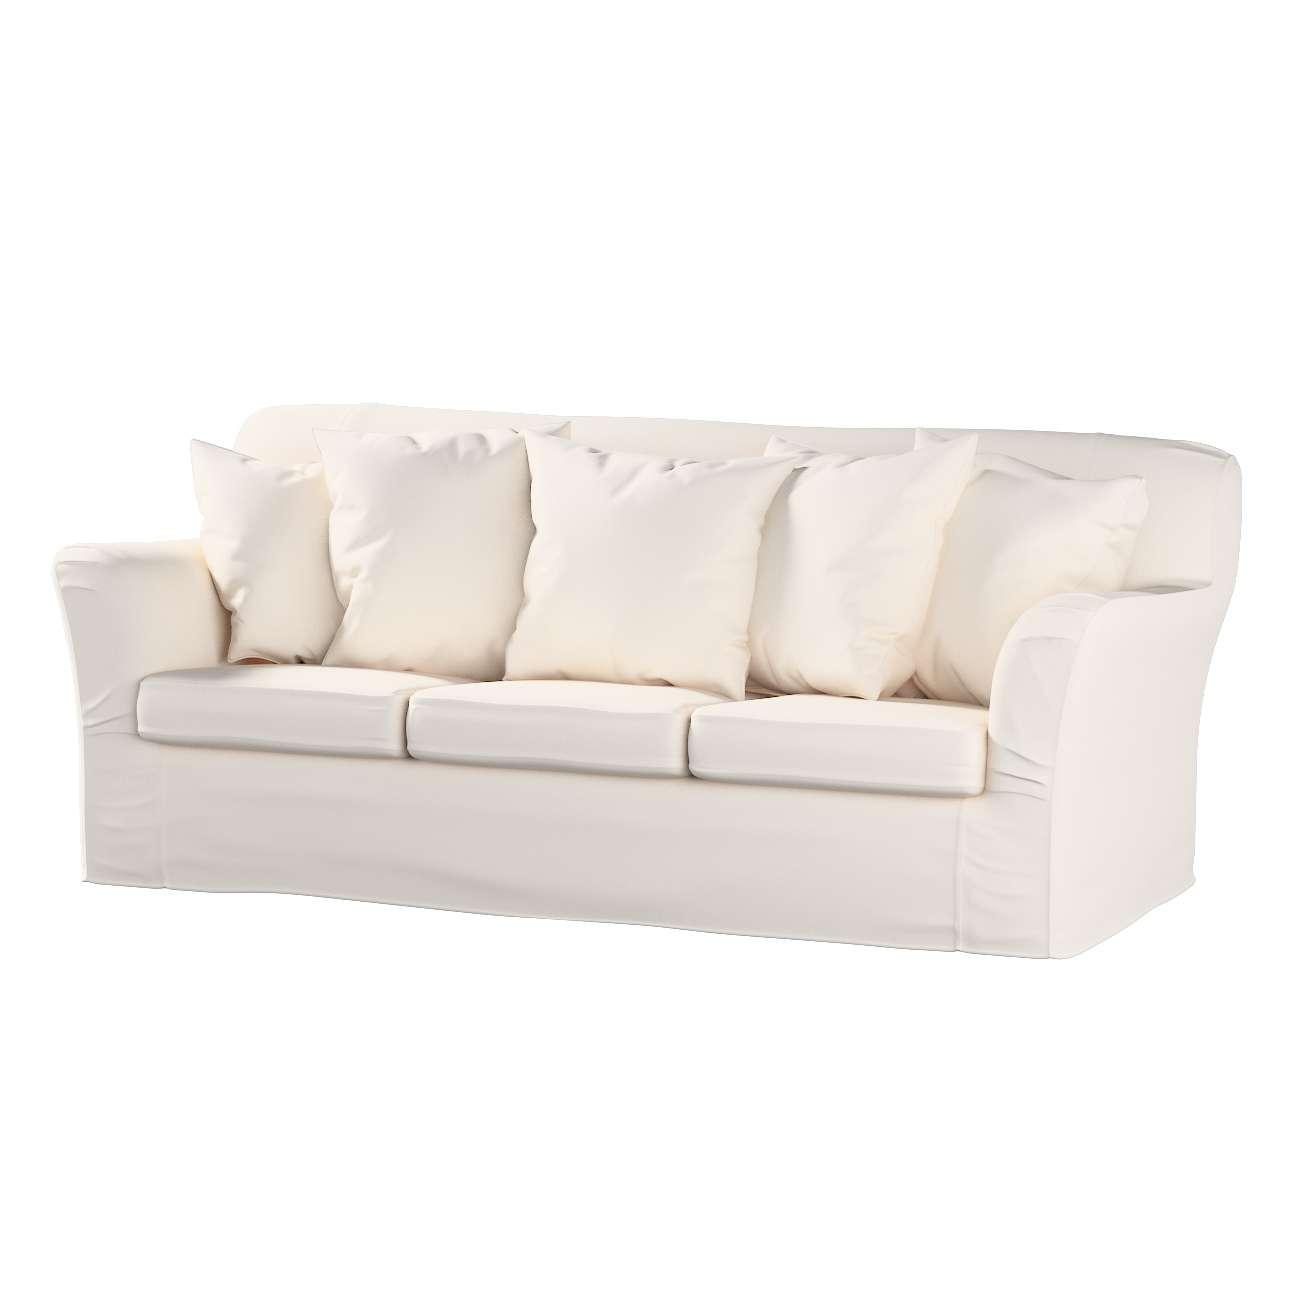 TOMELILLA  trivietės sofos užvalkalas TOMELILLA trivietė sofa kolekcijoje Etna , audinys: 705-01